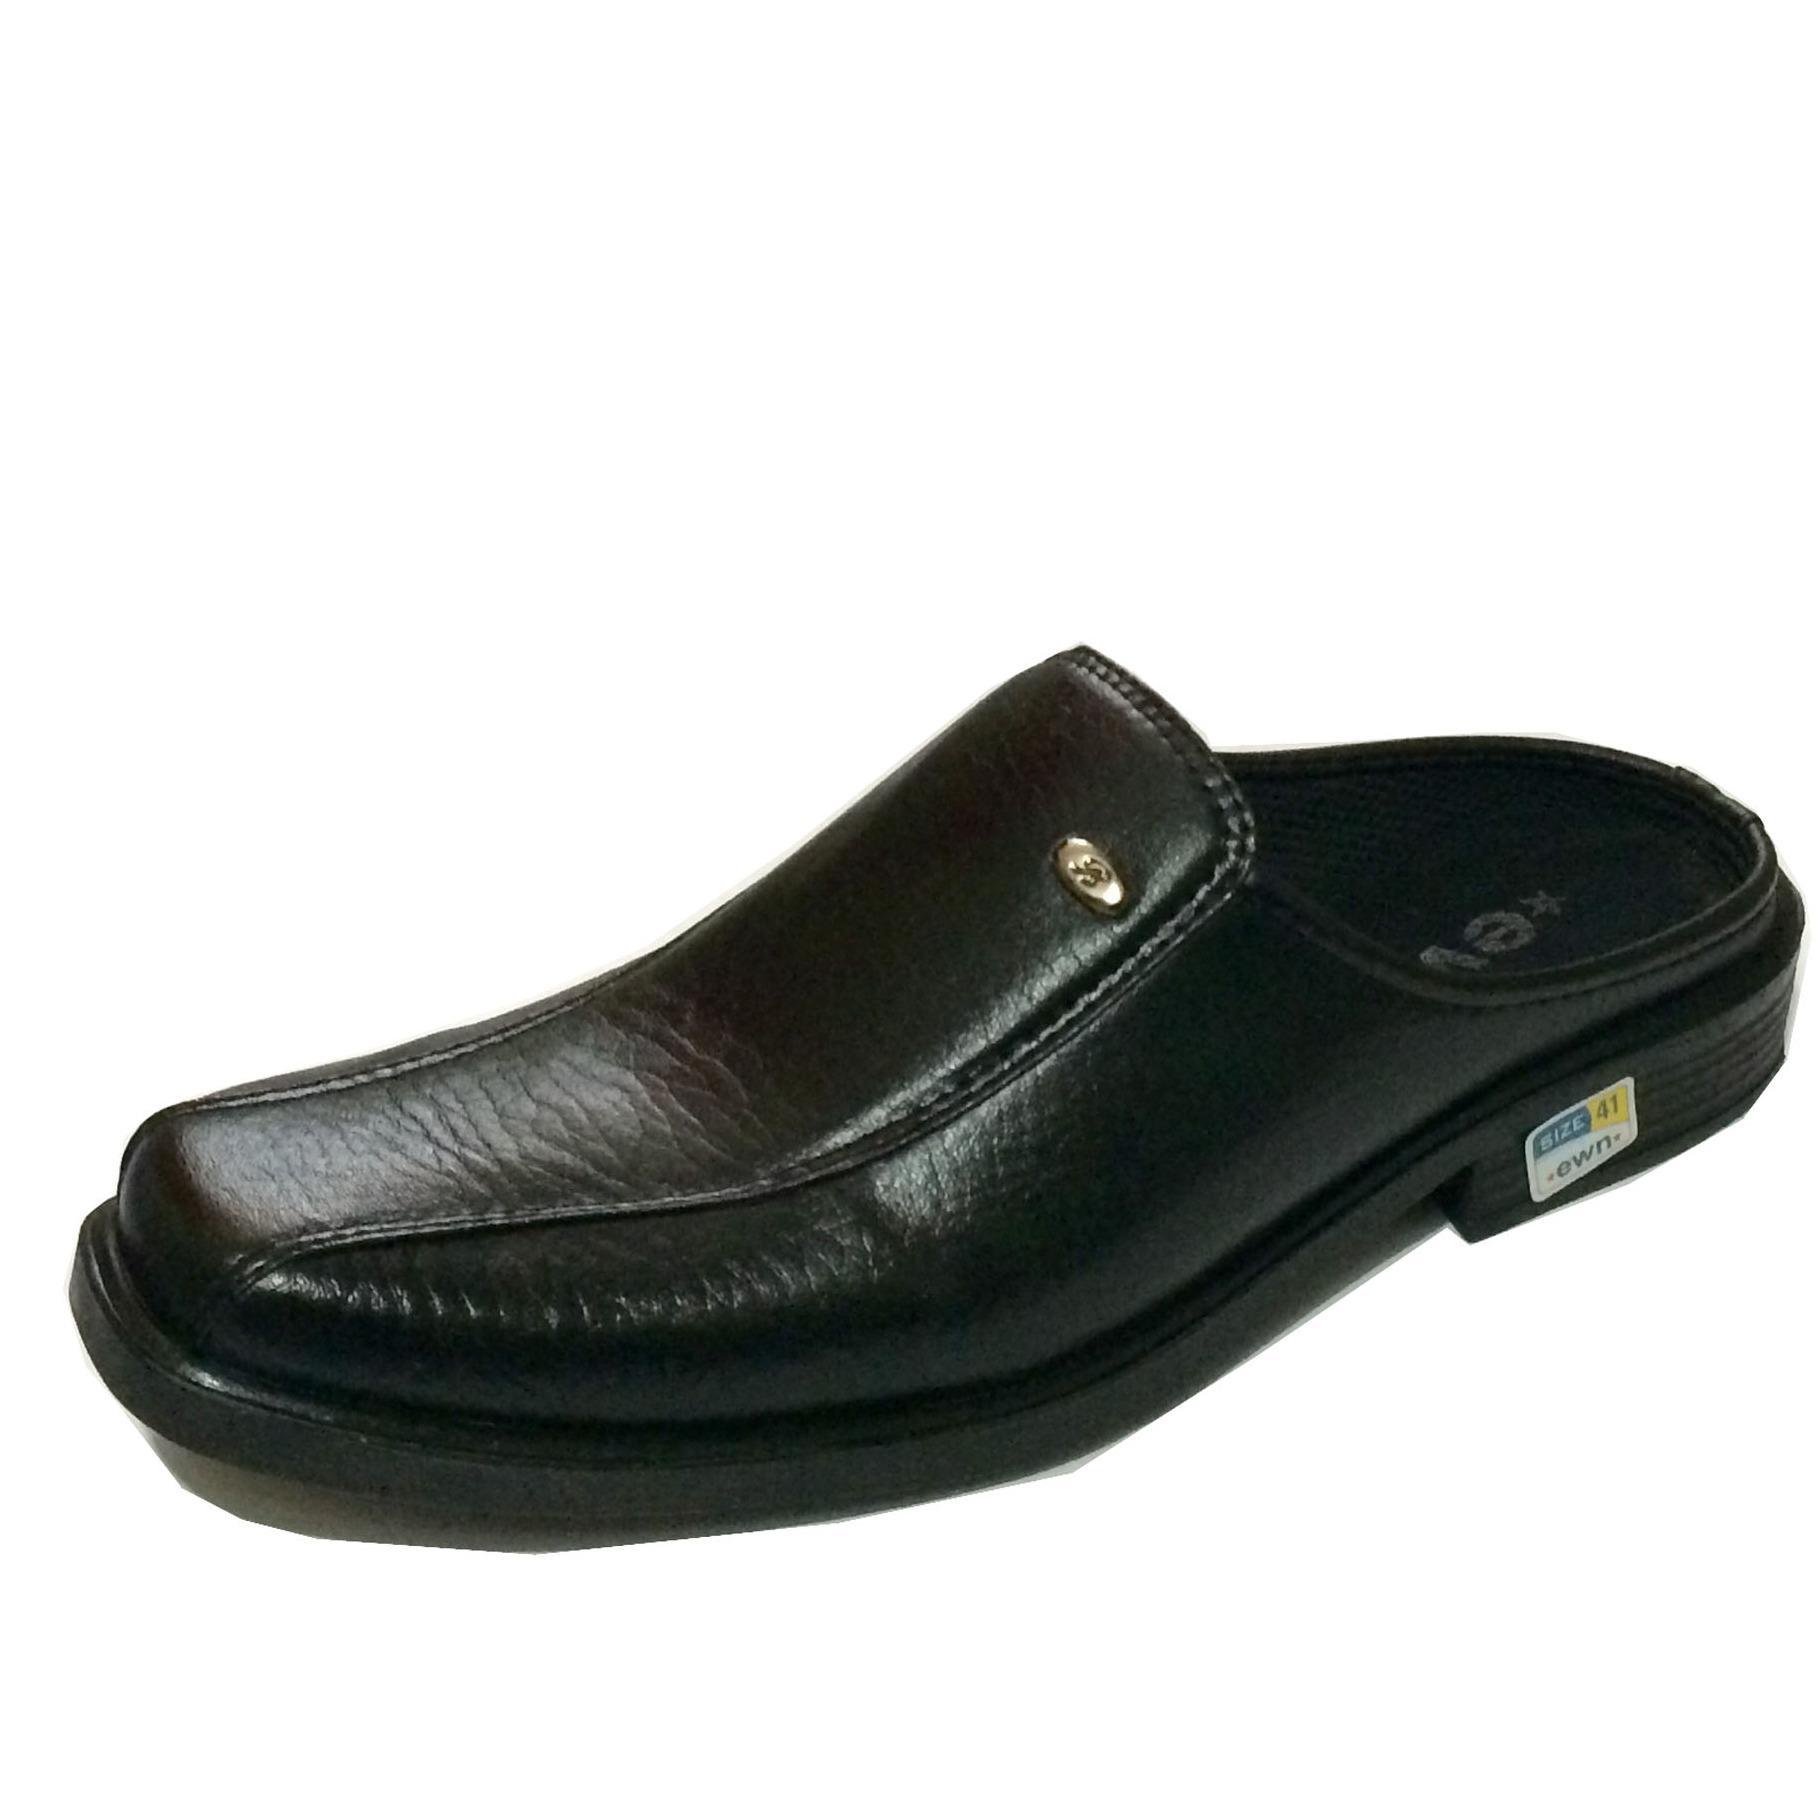 Ewn Sepatu Sandal Casual Pria / Sandal Selop Pria By Ewn Official Store.